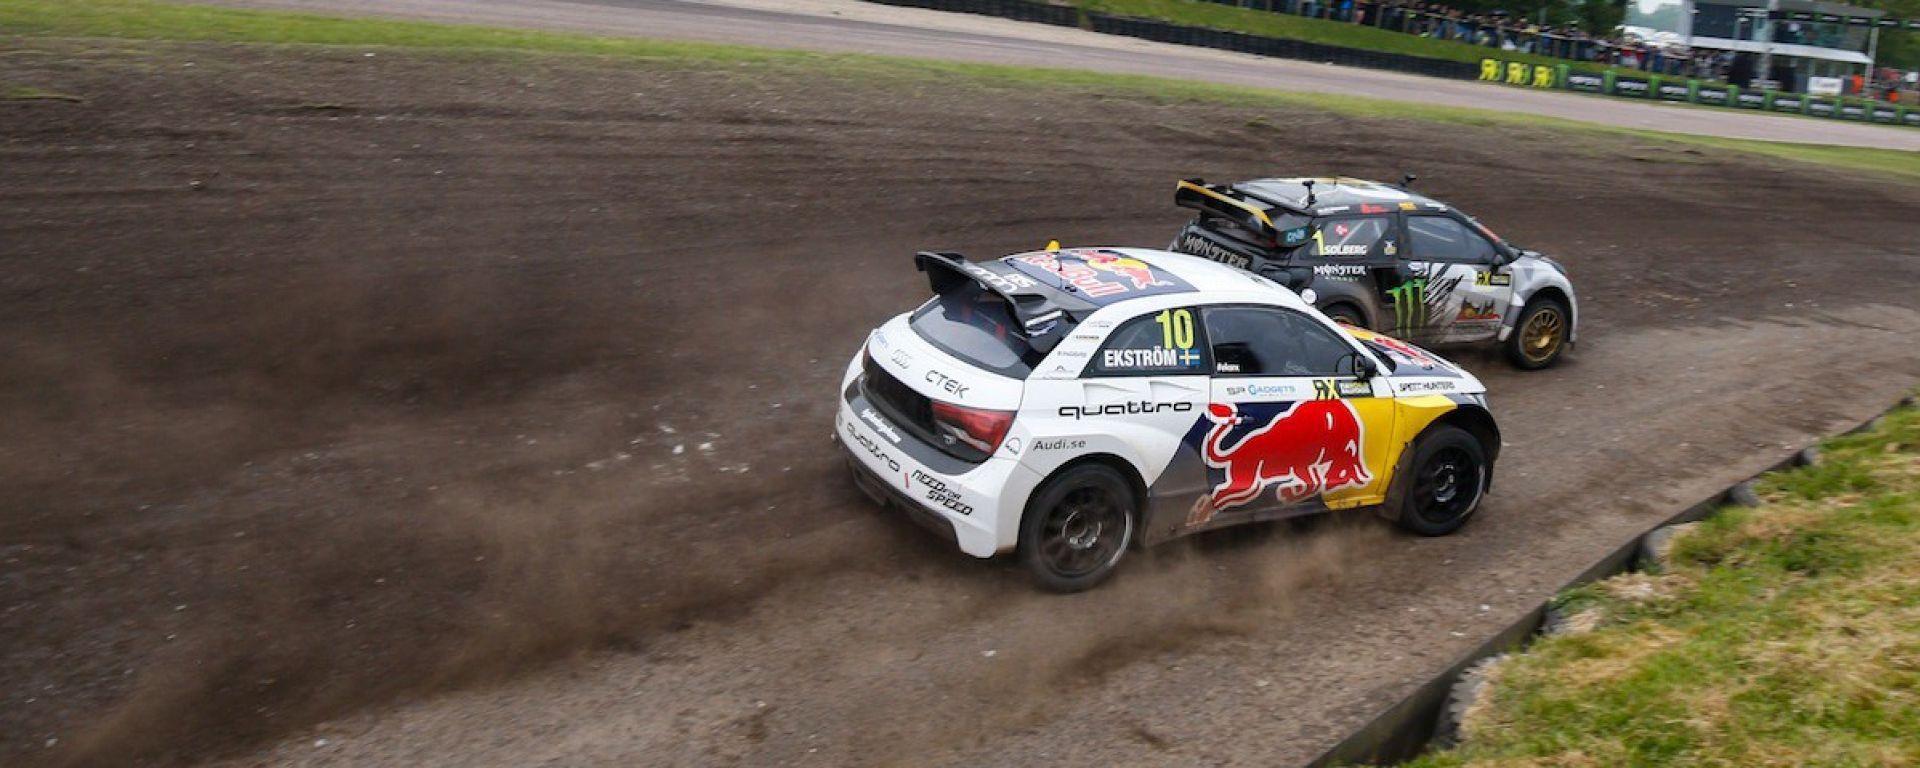 Rallycross 2018: GP Germania Estering - Info, risultati, programma, orari